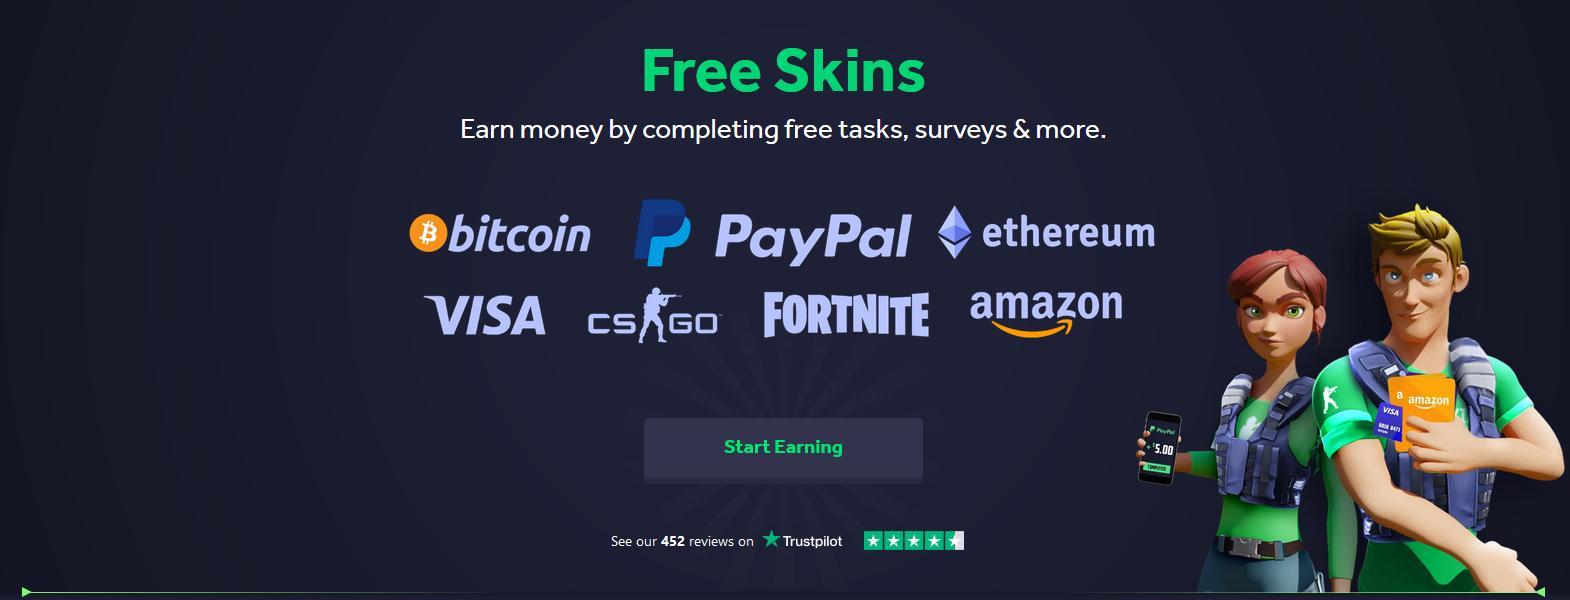 Freeskins.com - Earn free CS:GO skins